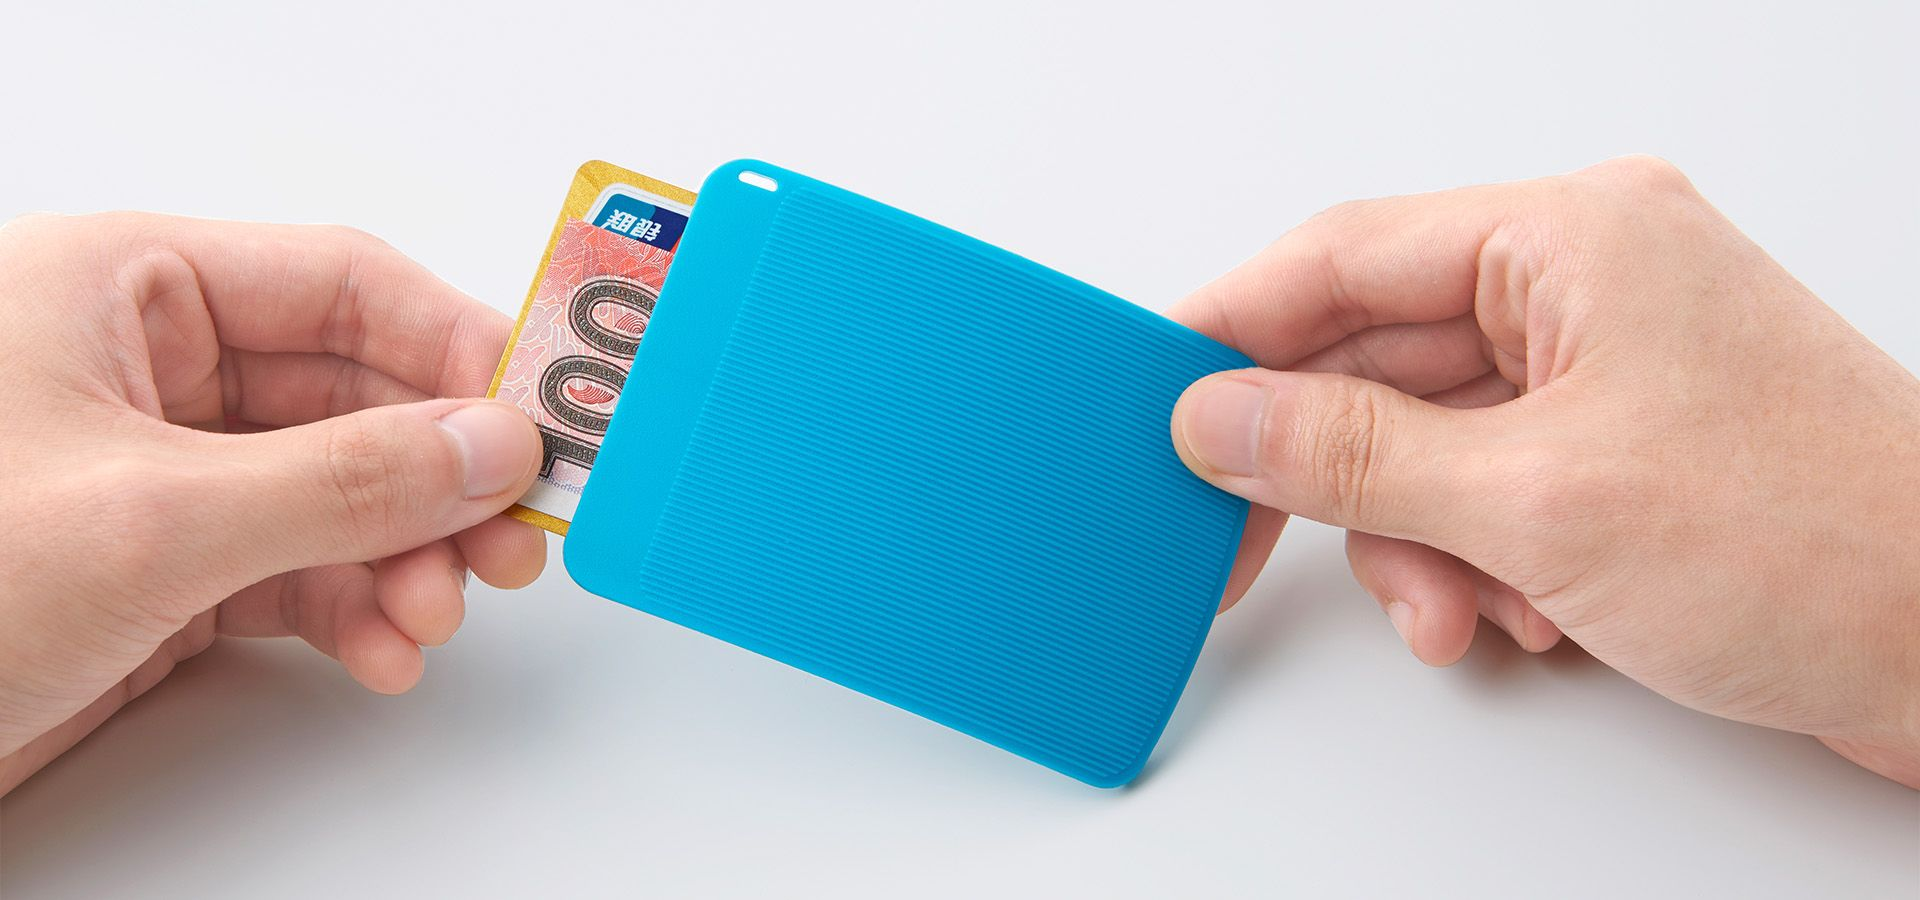 卡夹(卡夹 / 零钱夹)